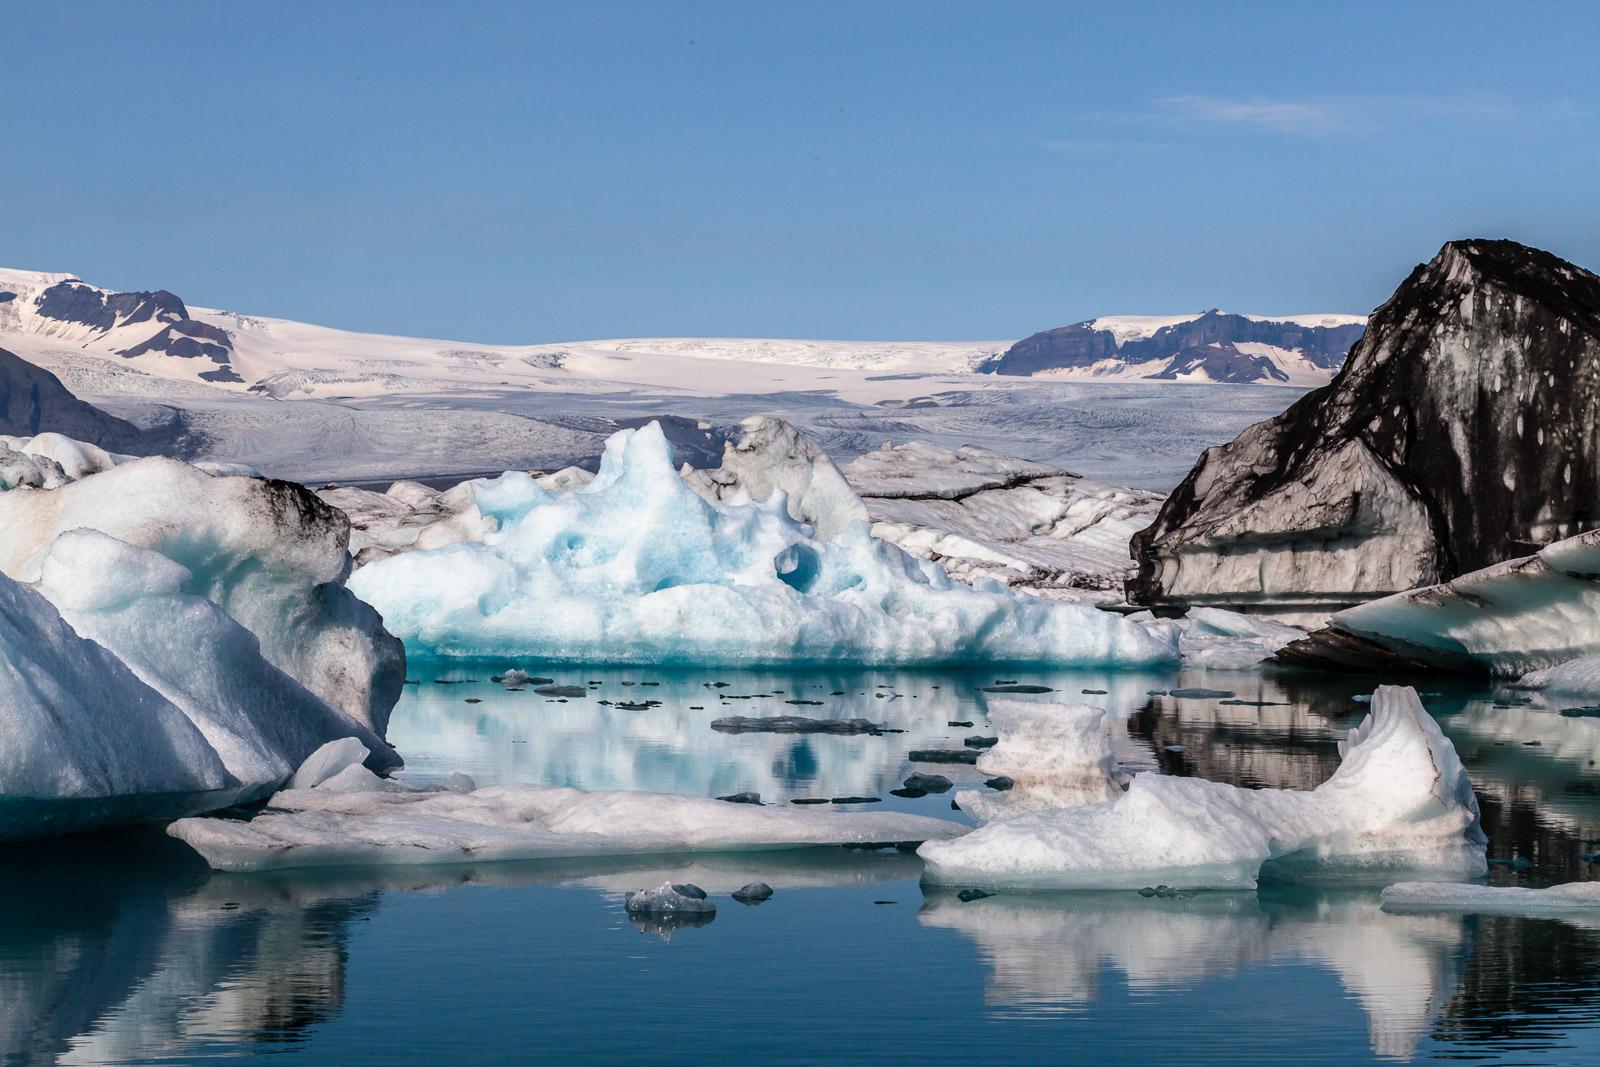 Iceland pt. 2